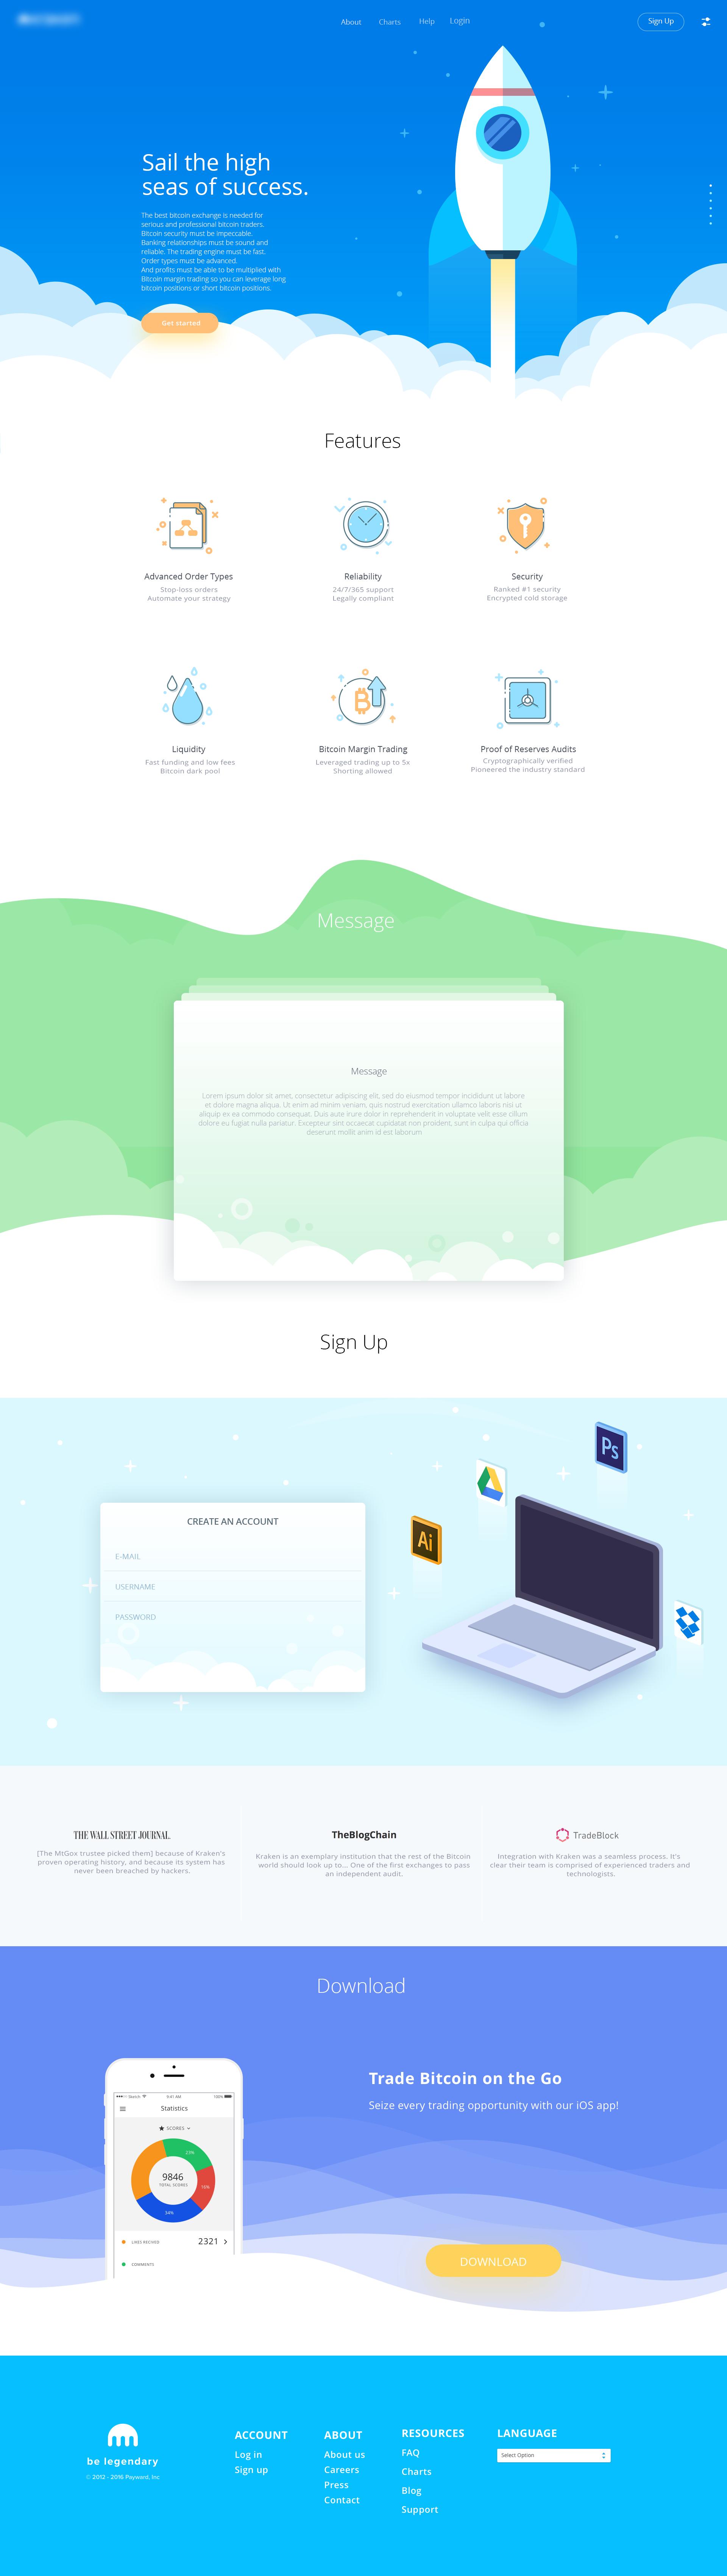 Zaib Ali, talentueux Webdesigner et Designer d'interface #30